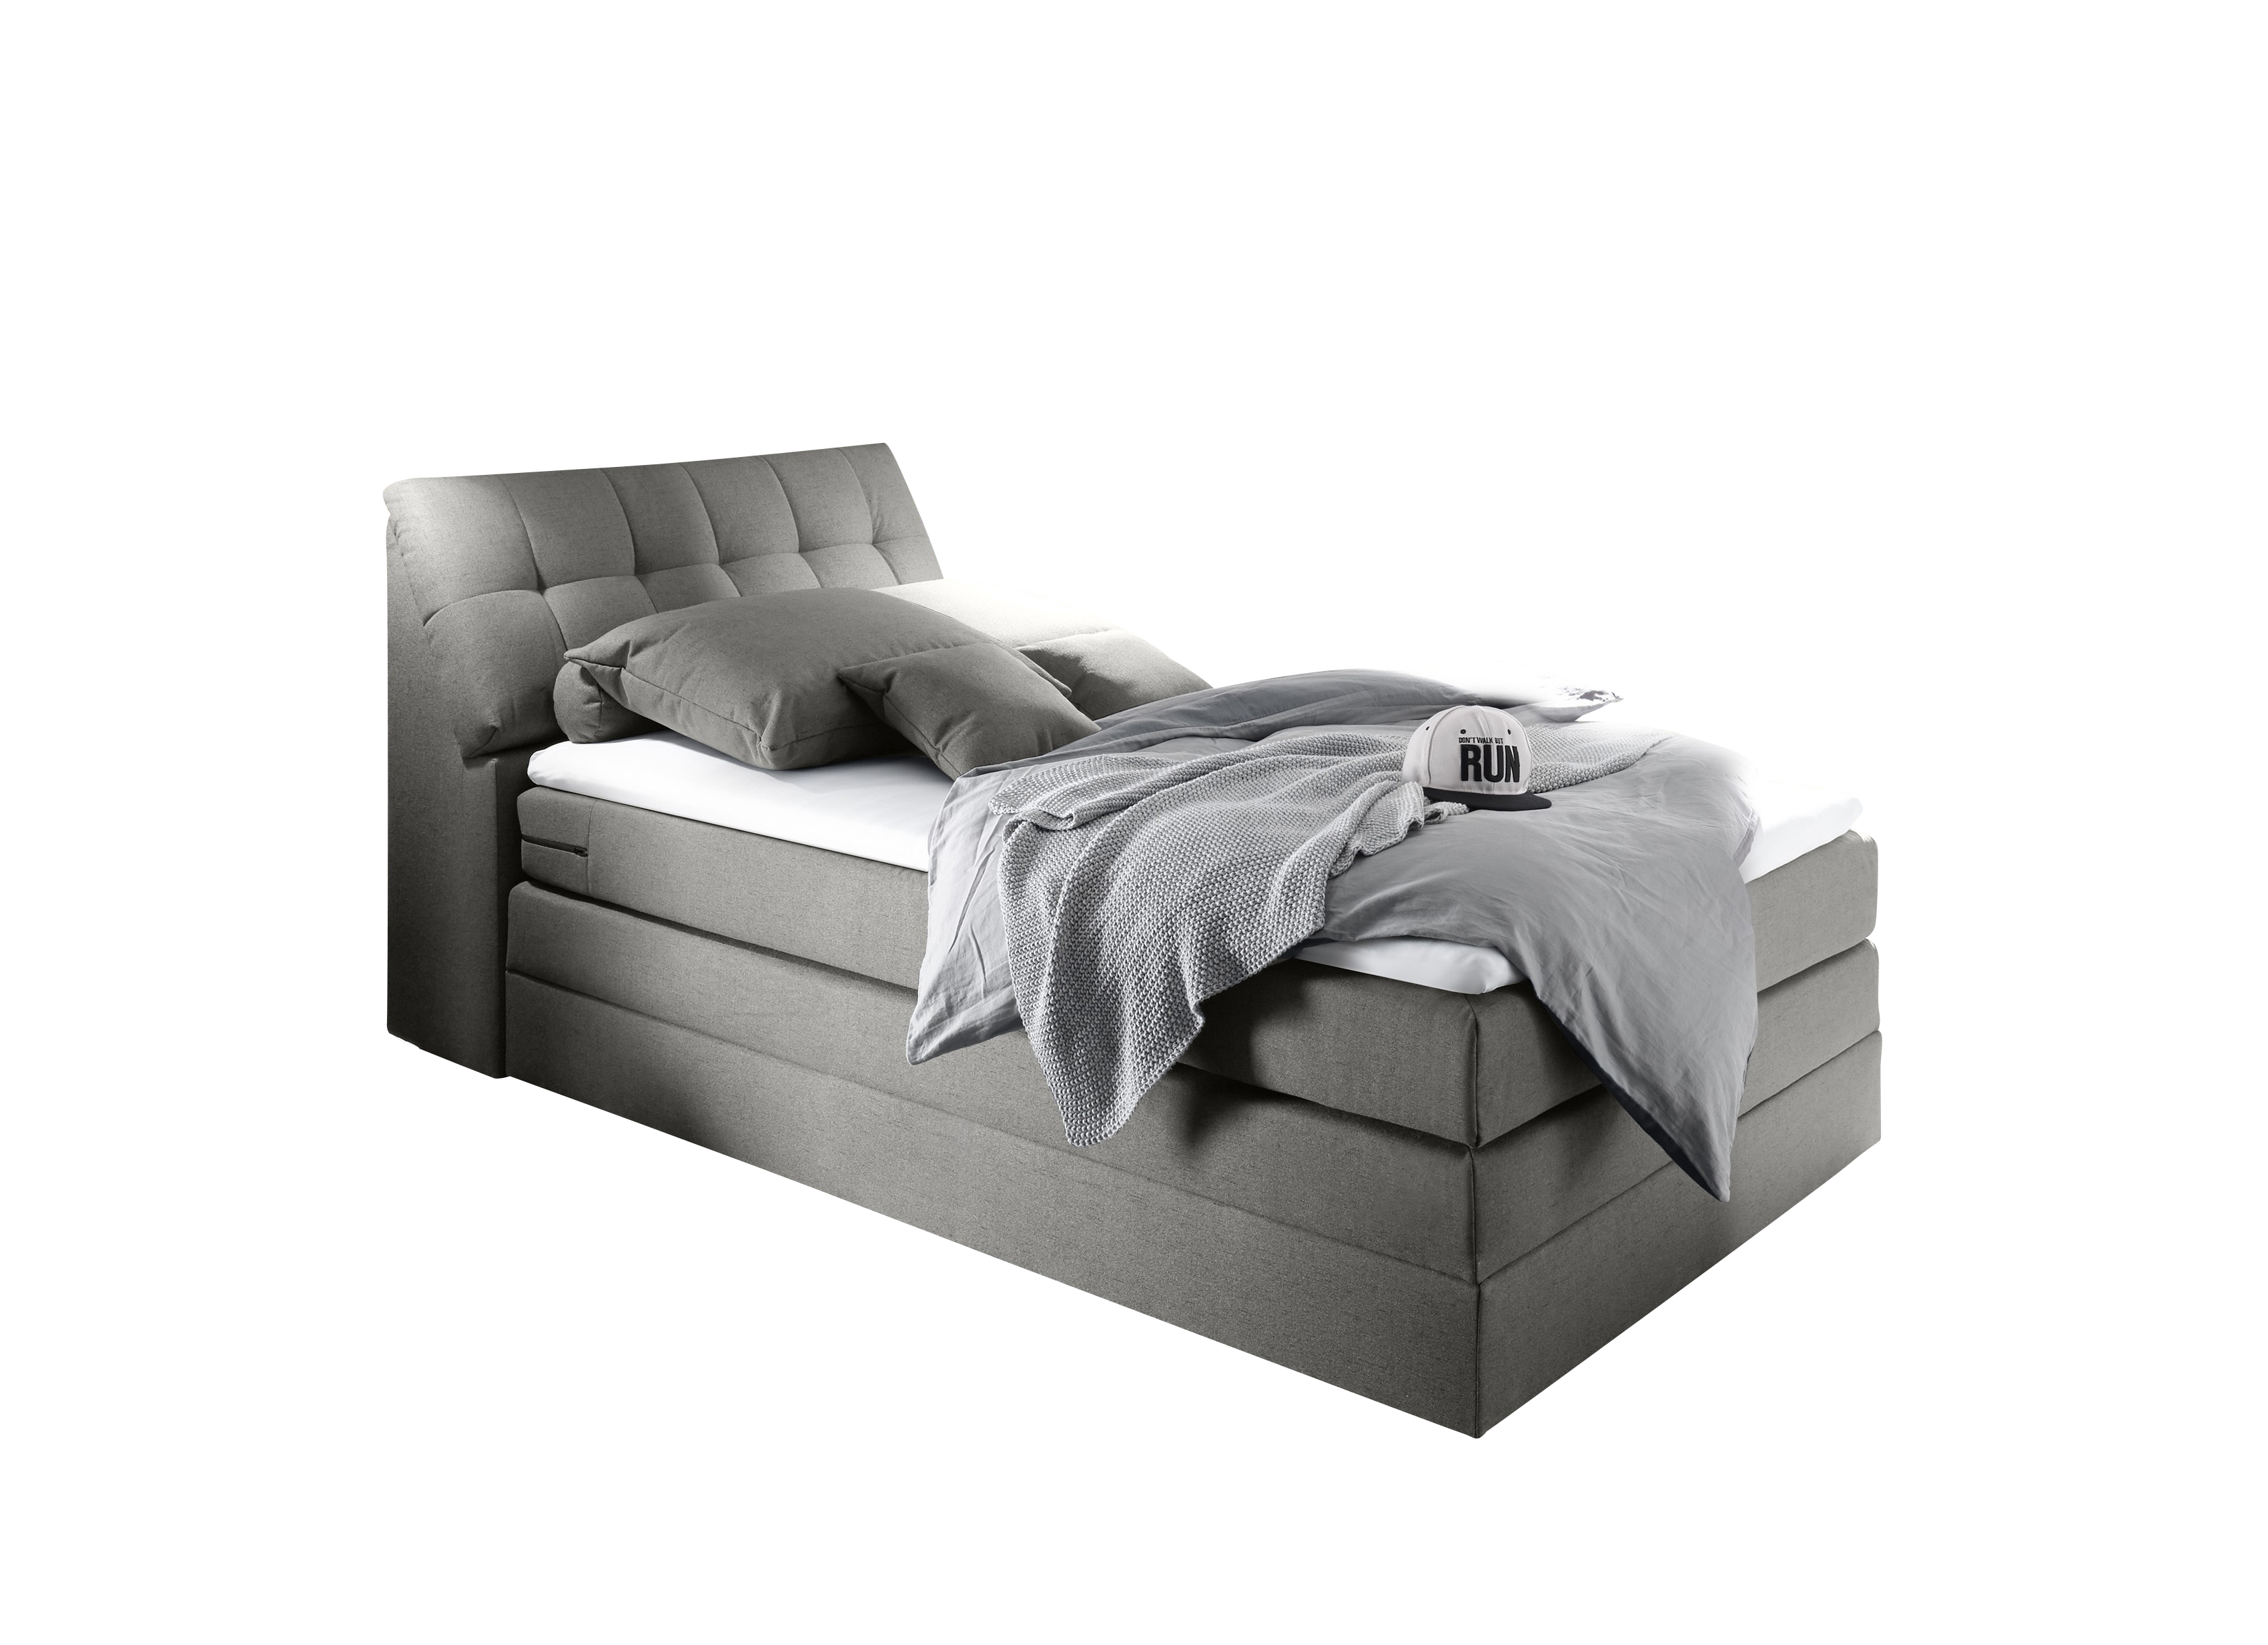 Boxspringbett Space grey 100% Polyester